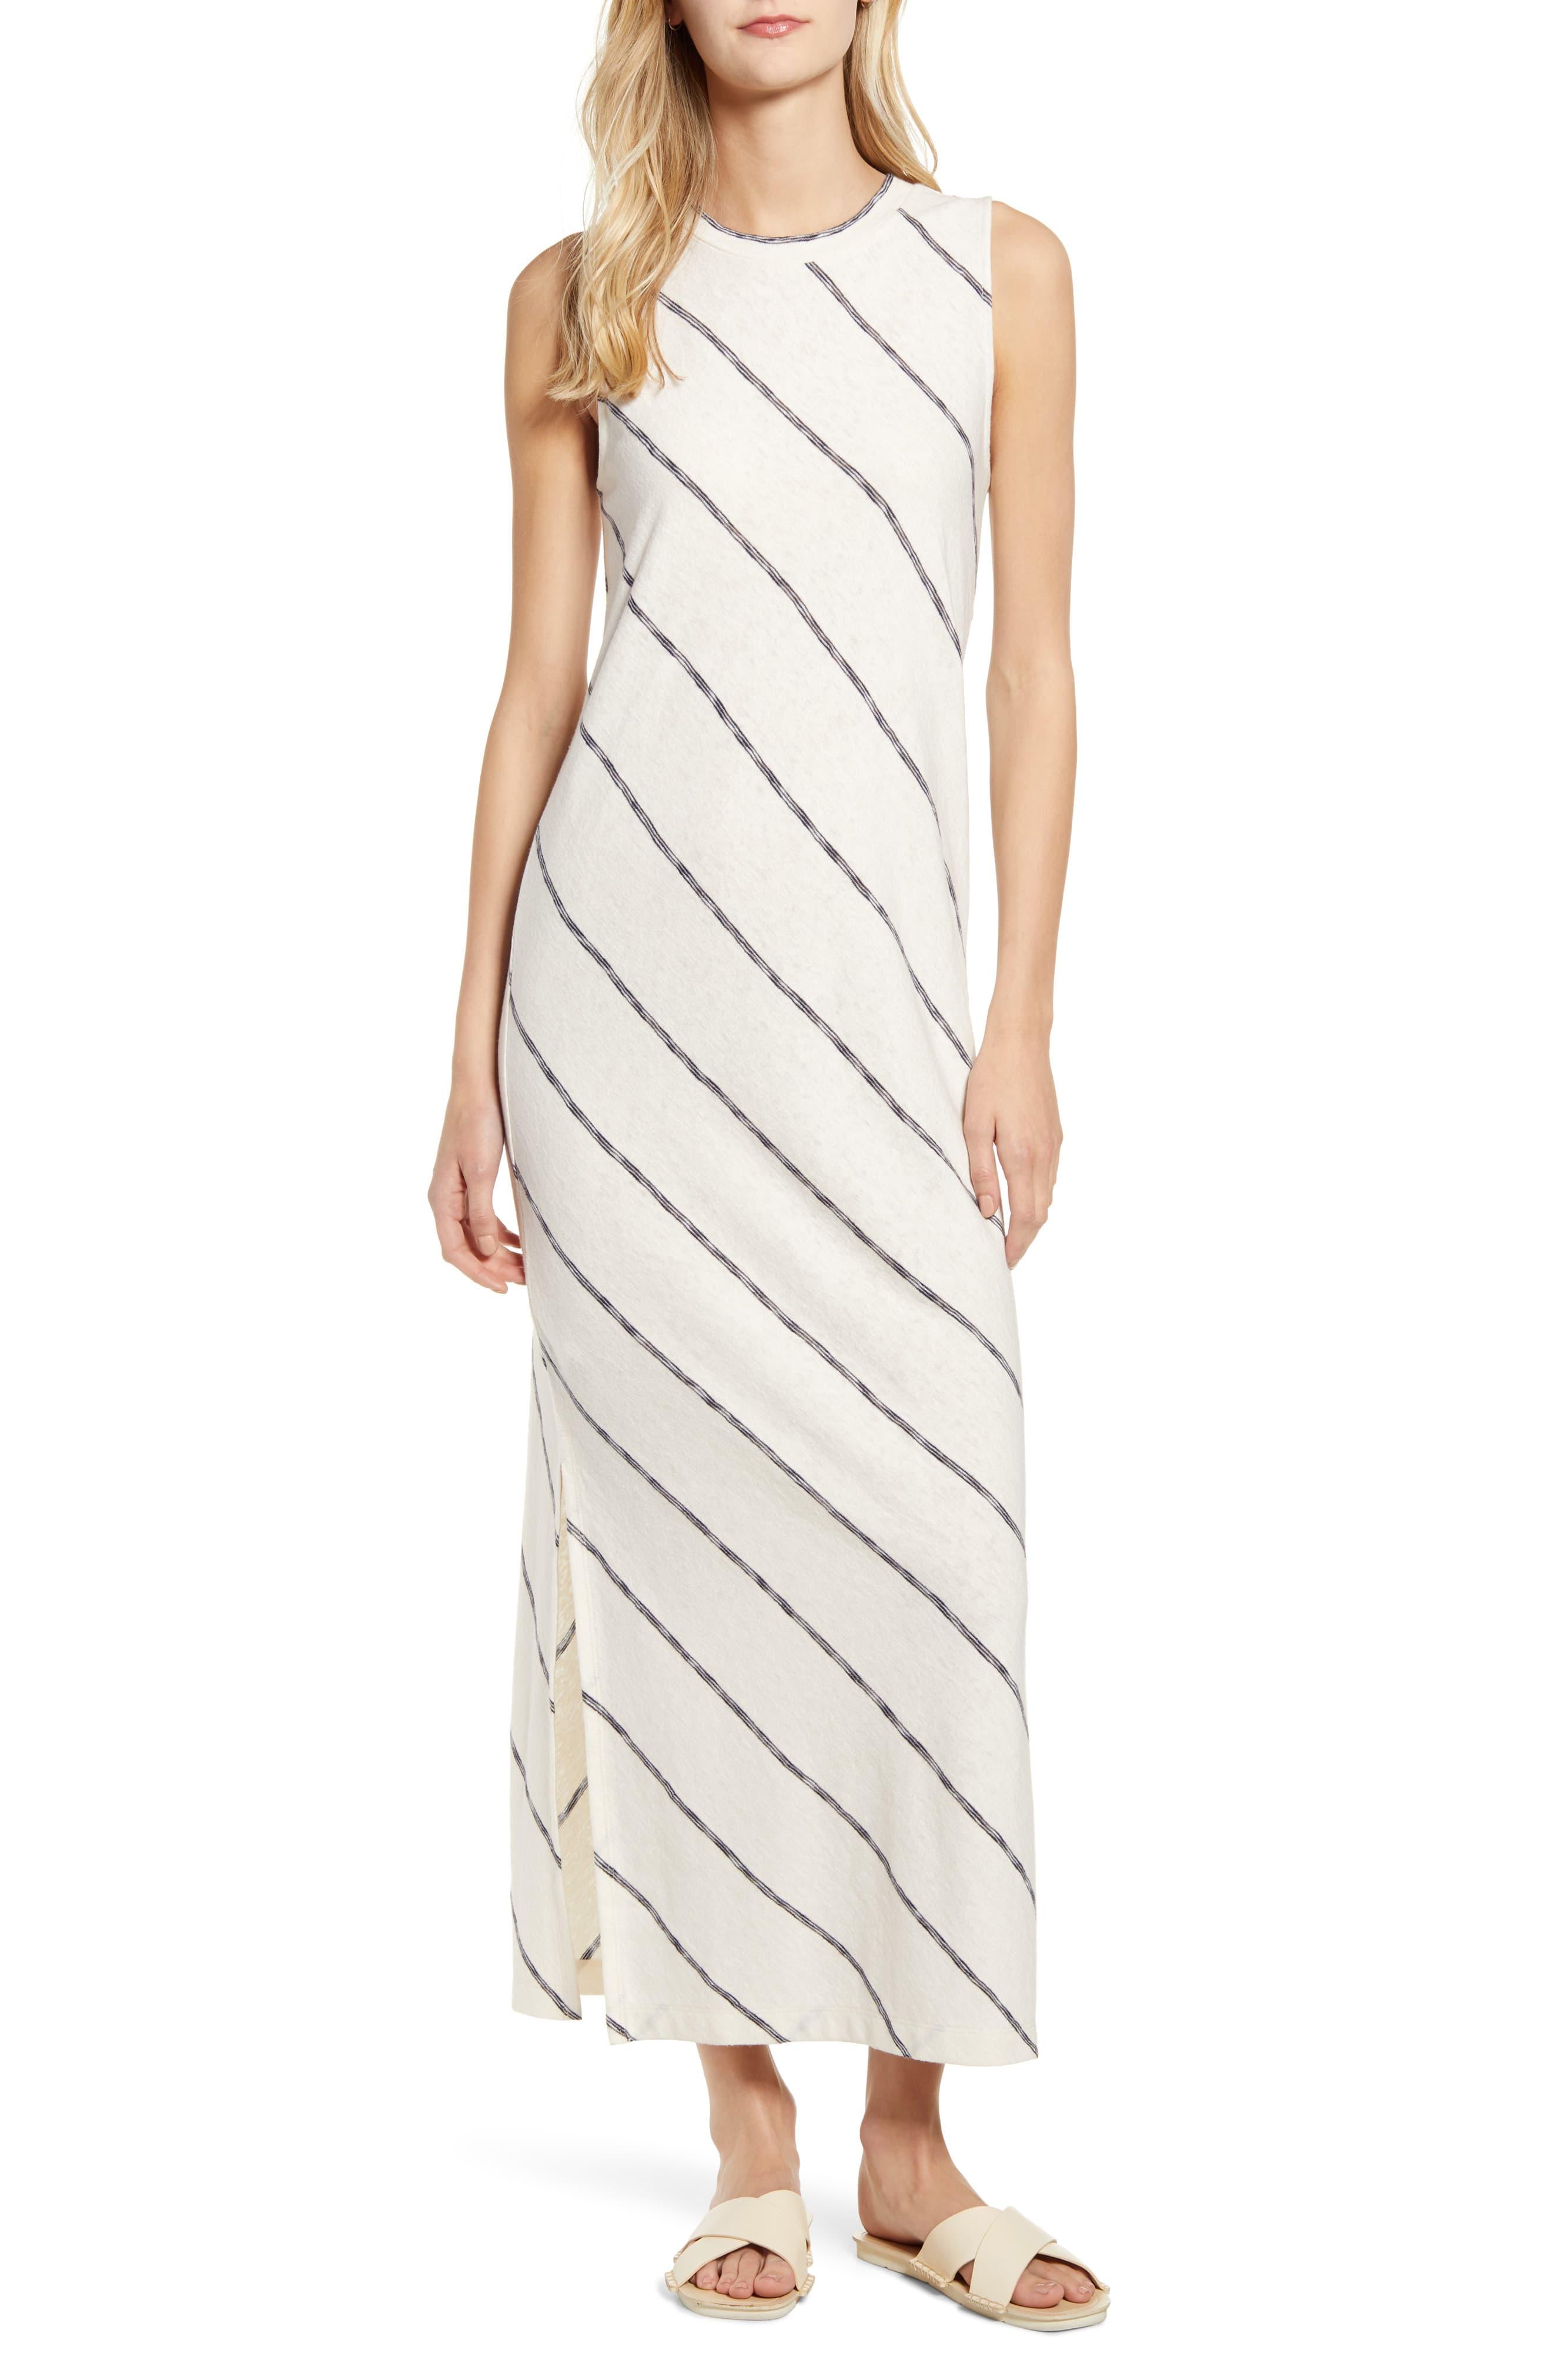 Women S Lou Grey Striped Maxi Dress Size Large White Striped Maxi Dresses Fashion Clothes Women Maxi Dress [ 4048 x 2640 Pixel ]